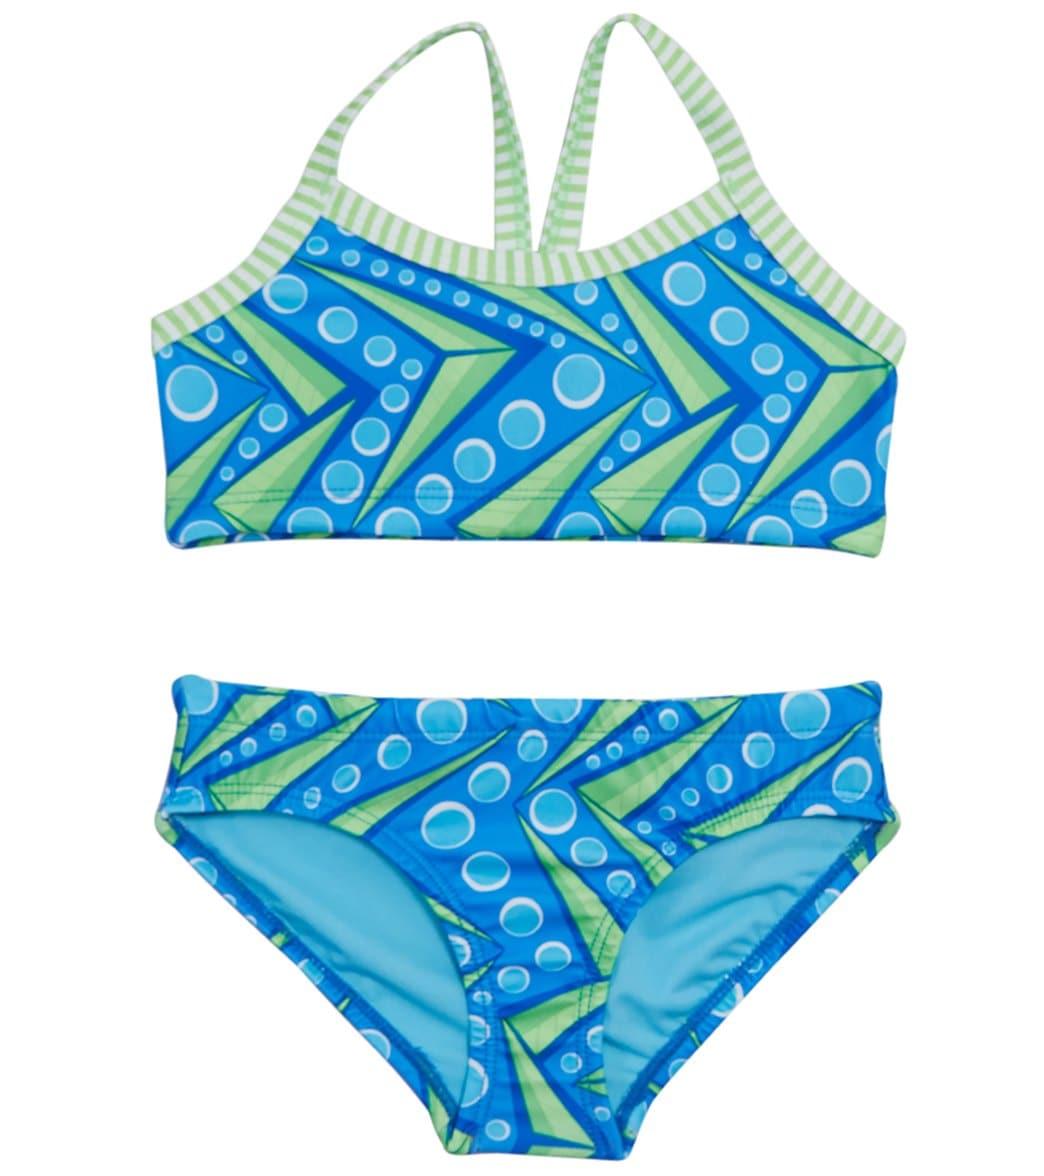 132cf991d83 Dolfin Girls' Uglies Zenon Two Piece Swimsuit at SwimOutlet.com